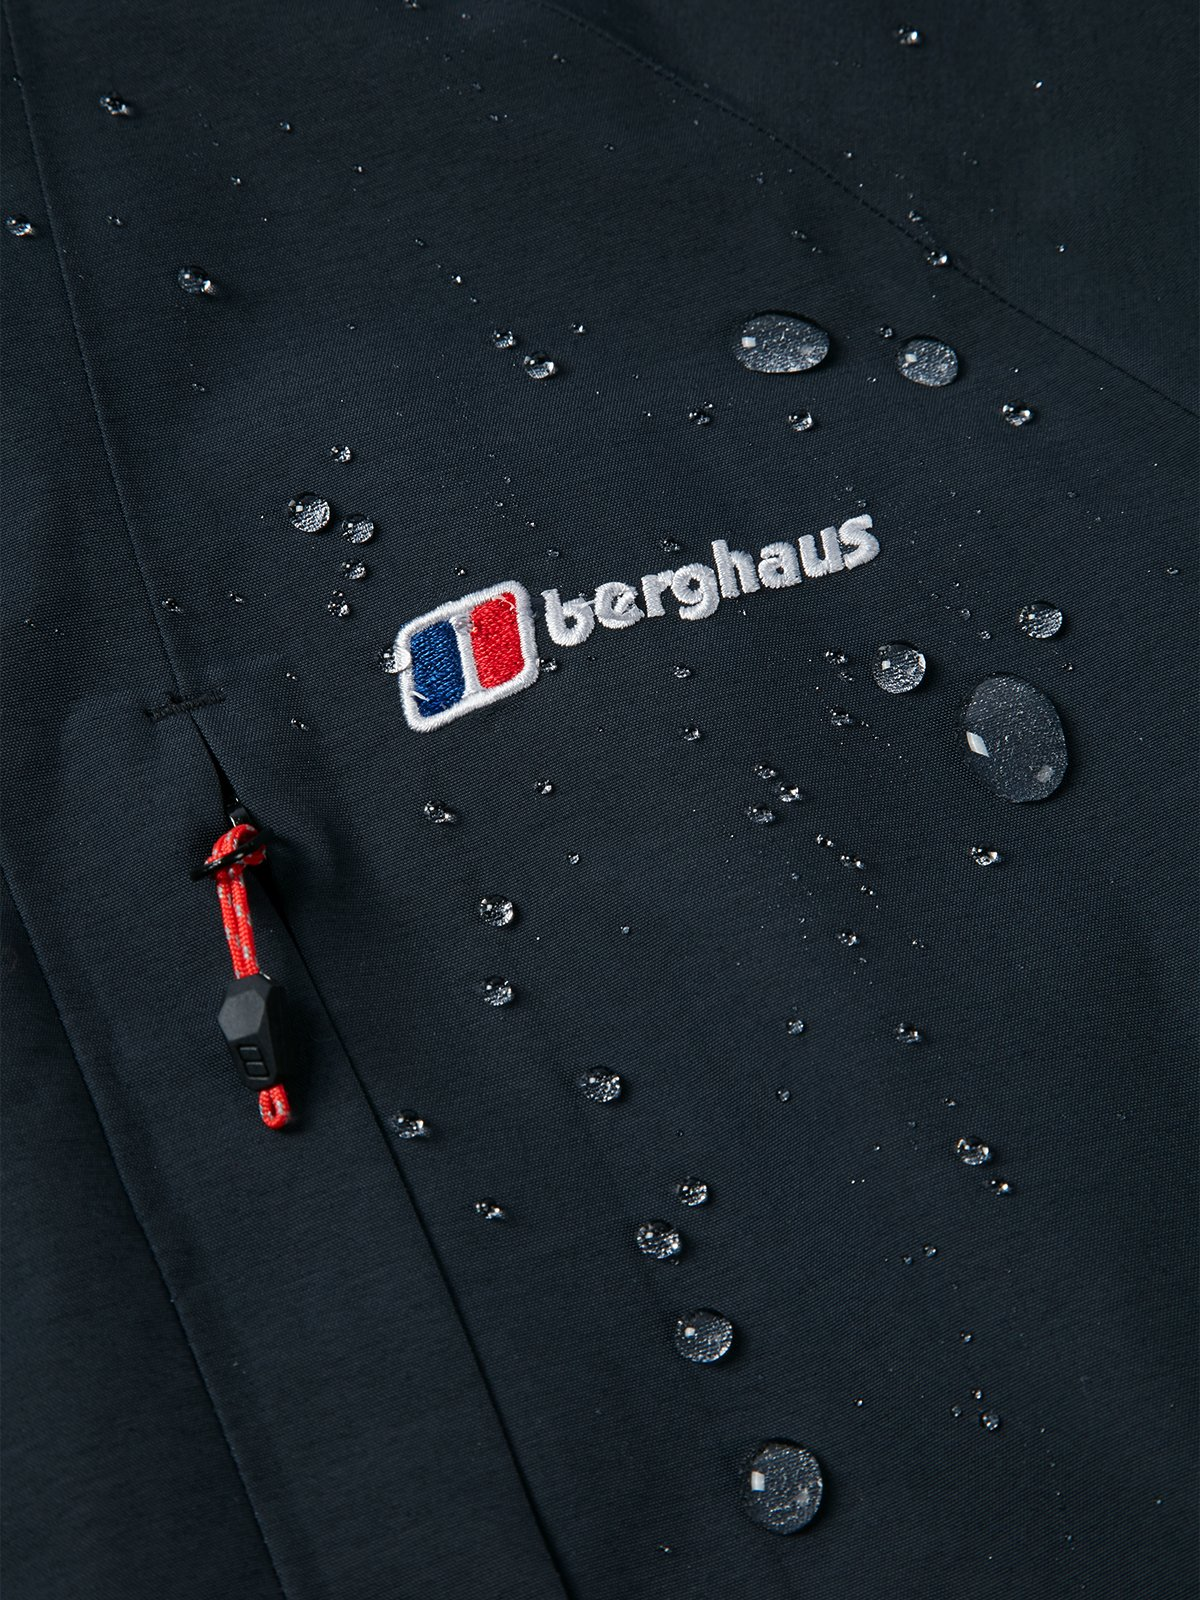 813gwBwLQiL - Berghaus Women's Hillmaster Gore-tex Waterproof Jacket